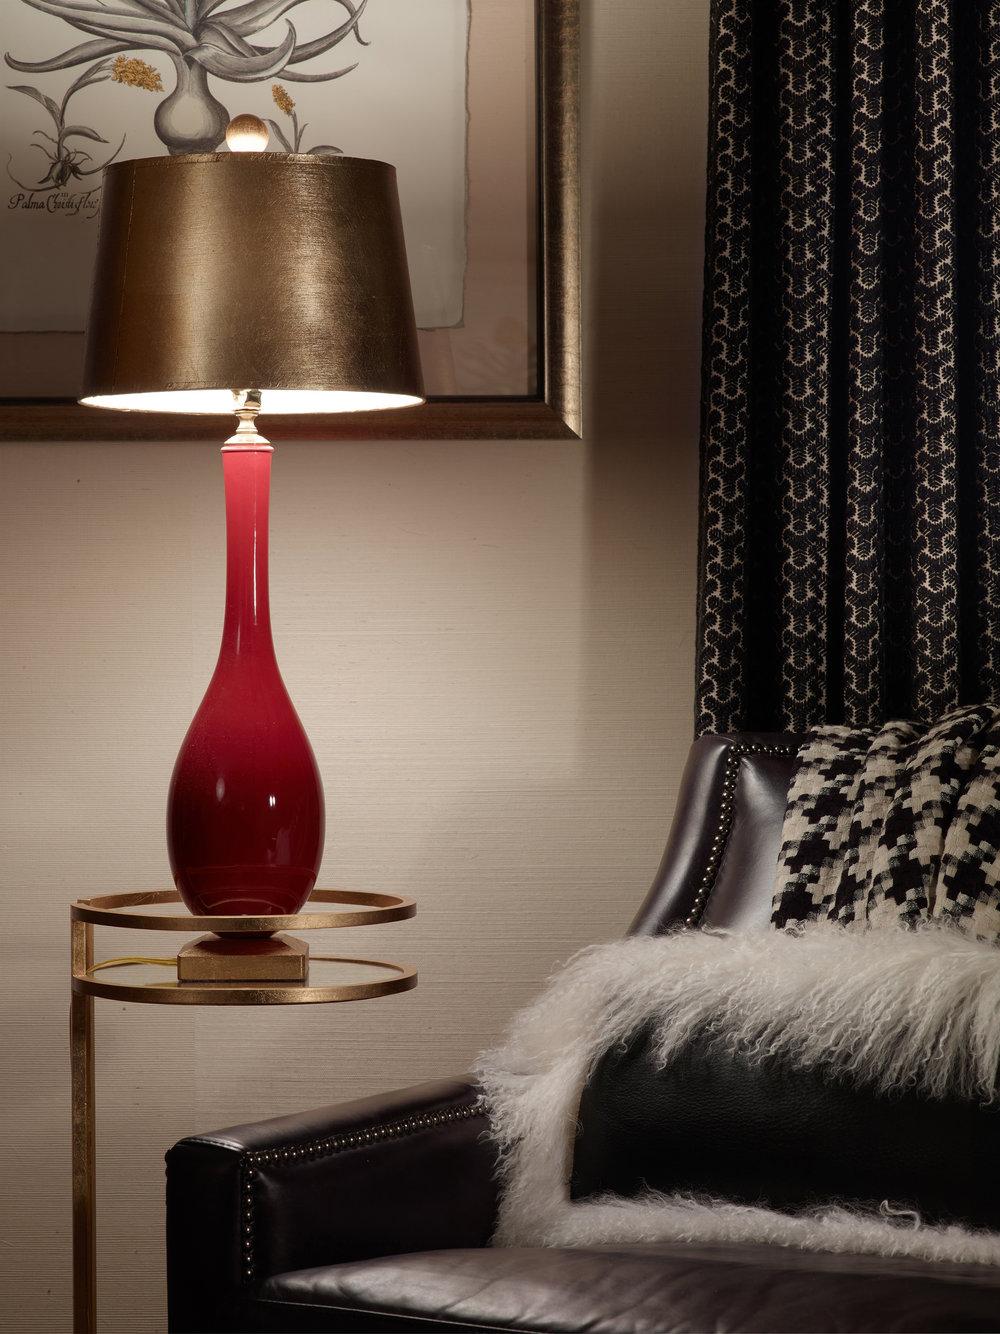 scmurphyllc_Living_room_red_lamp.jpg